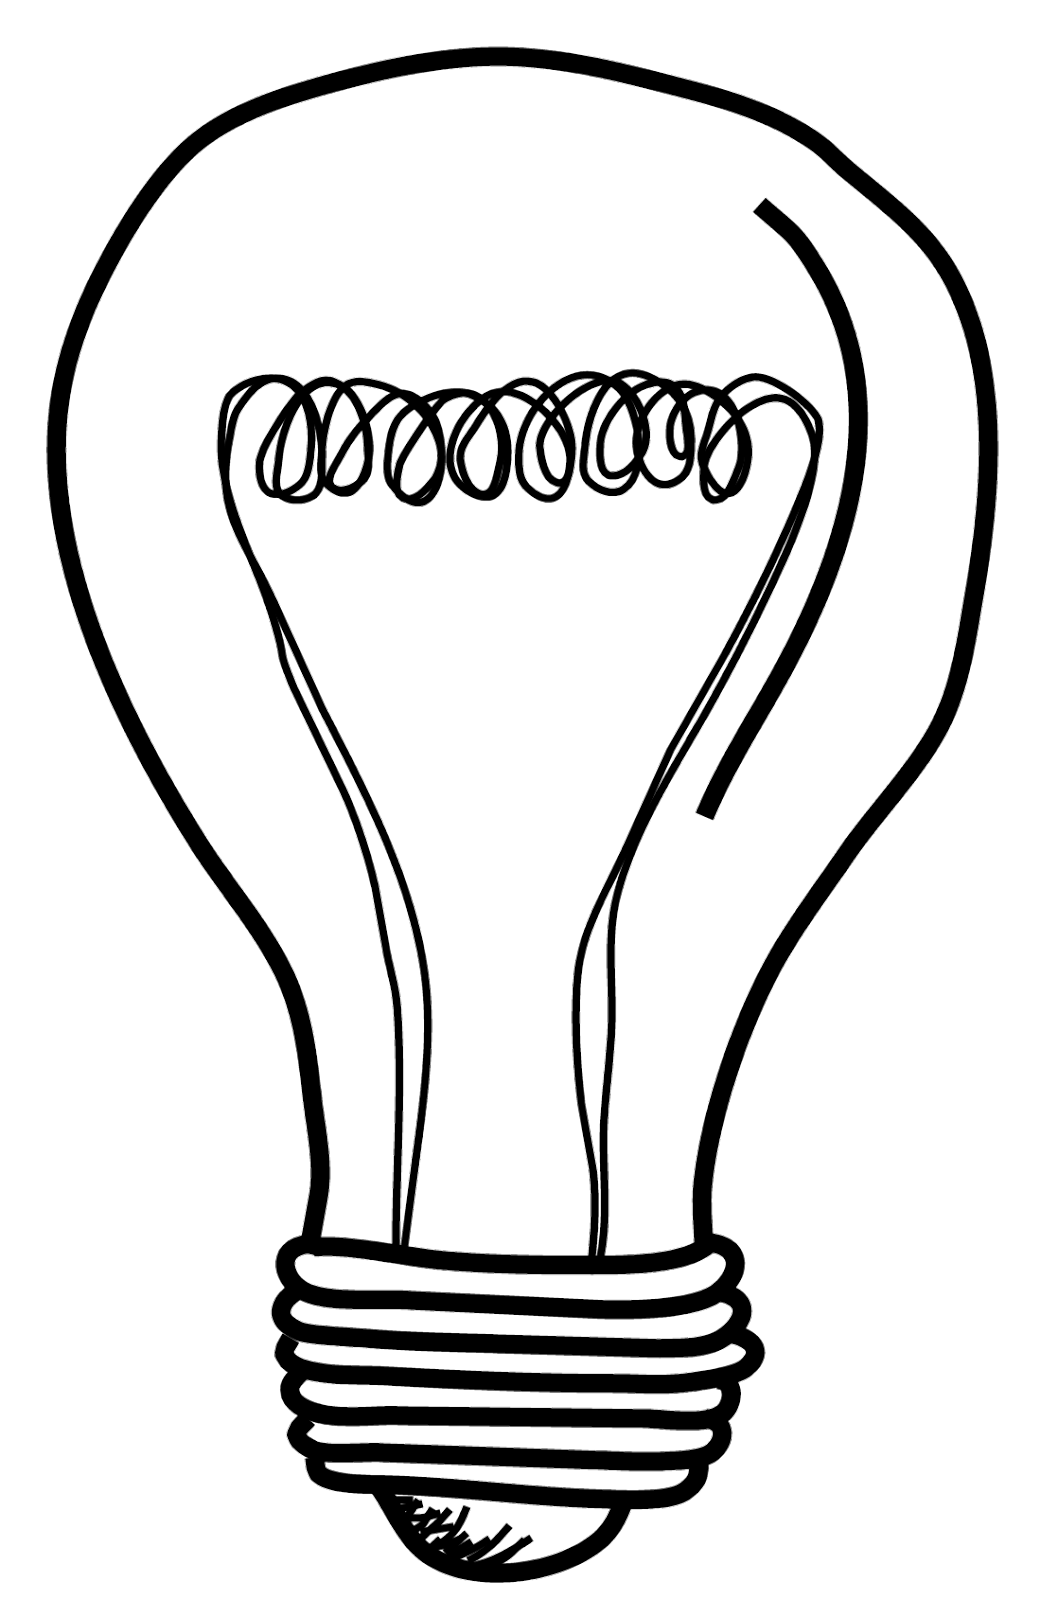 Light Bulb Png - ClipArt Best | Saul Bass Poster | Pinterest ... for Black Light Bulb Clip Art  569ane